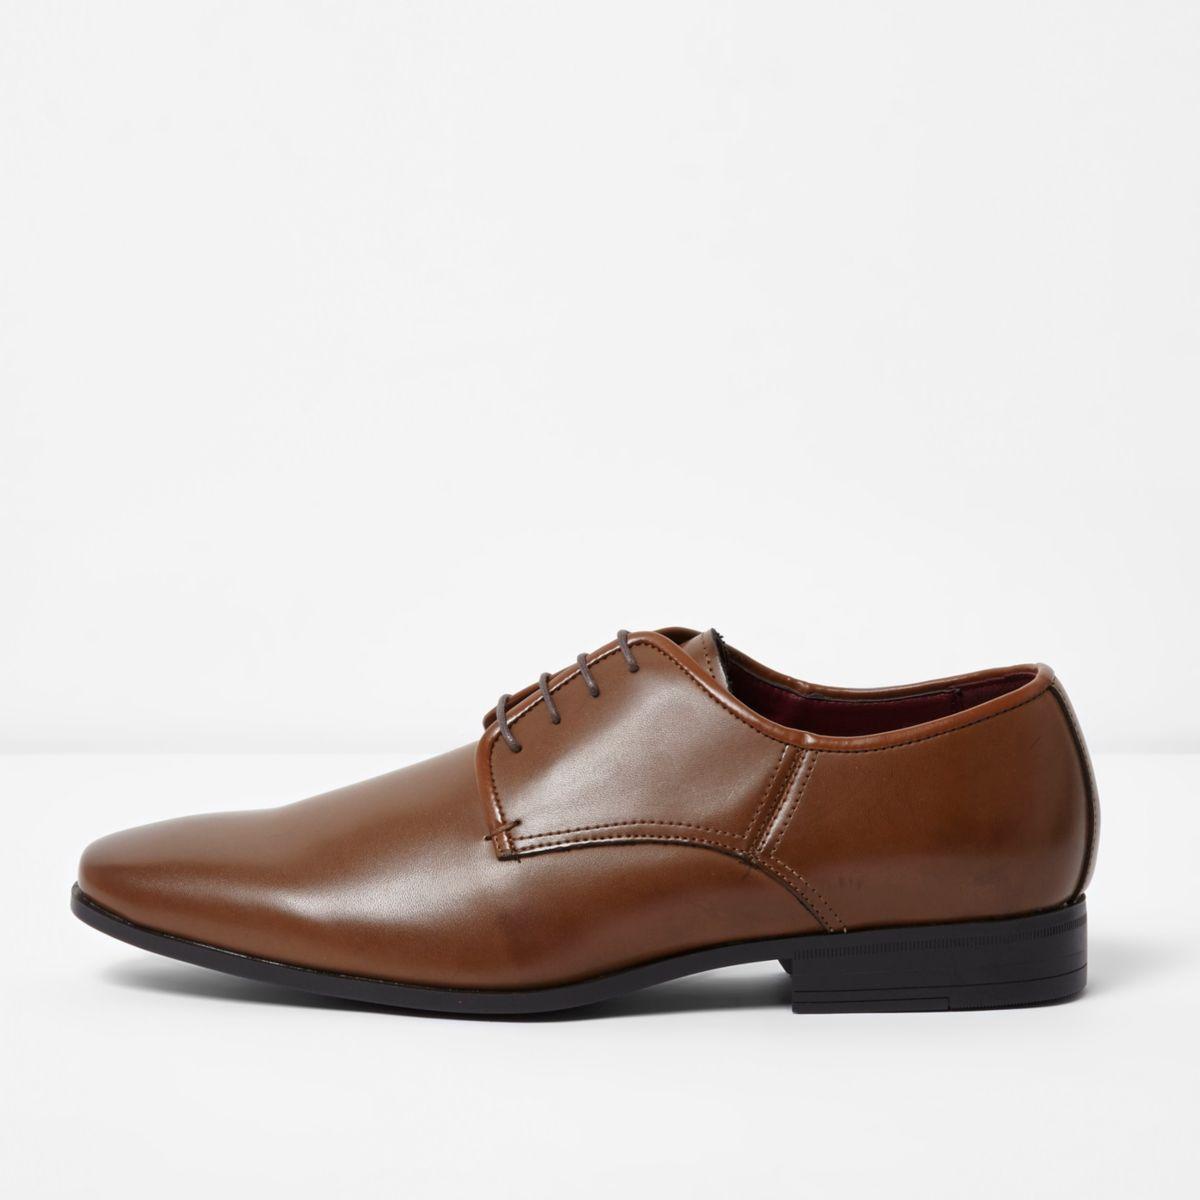 Tan brown lace-up smart shoes